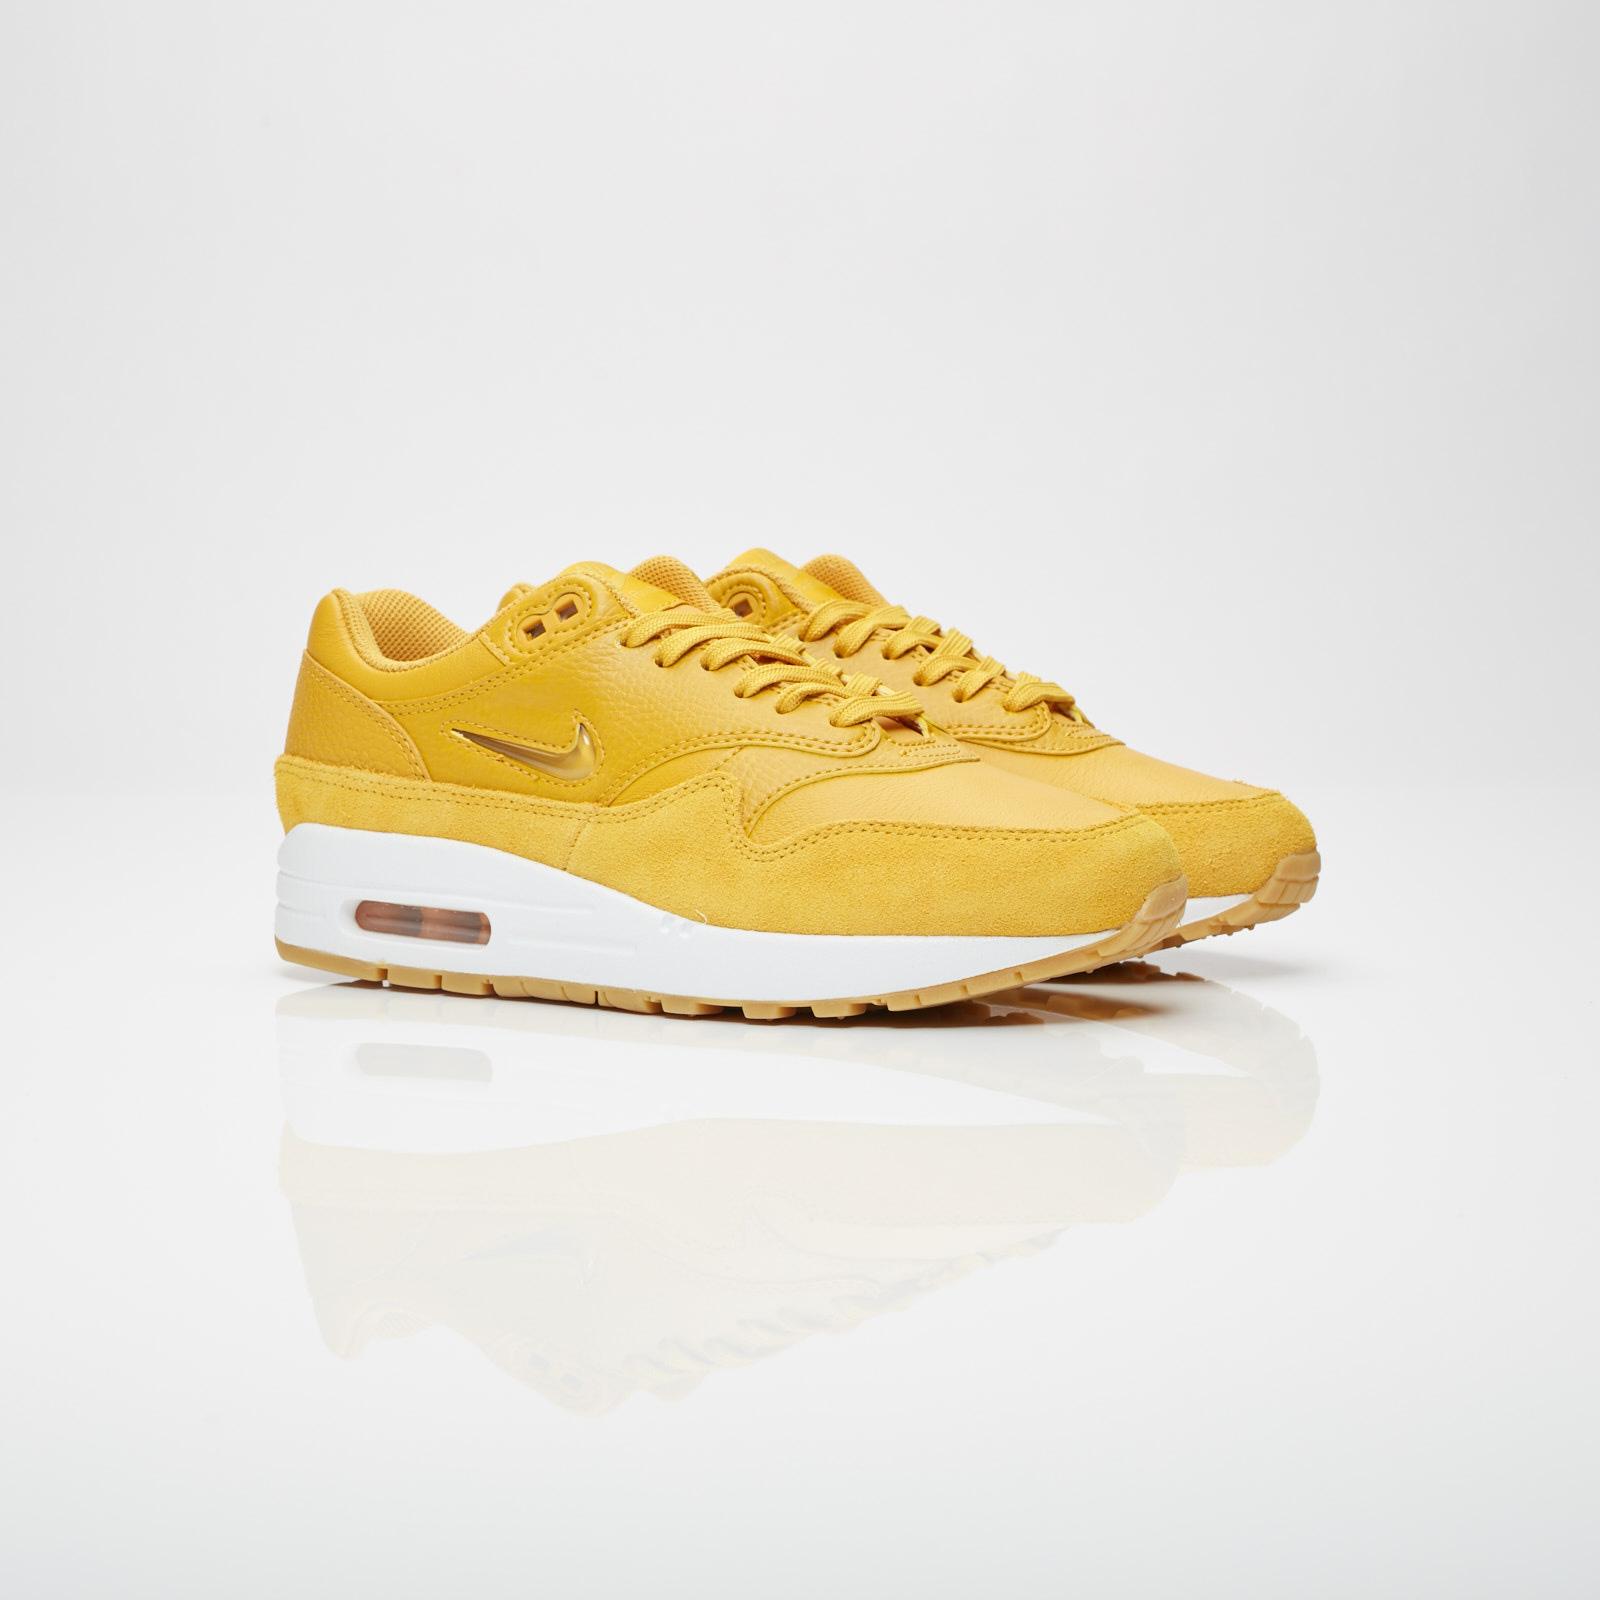 size 40 3f2b1 df4ec Nike Sportswear Wmns Air Max 1 Premium SC